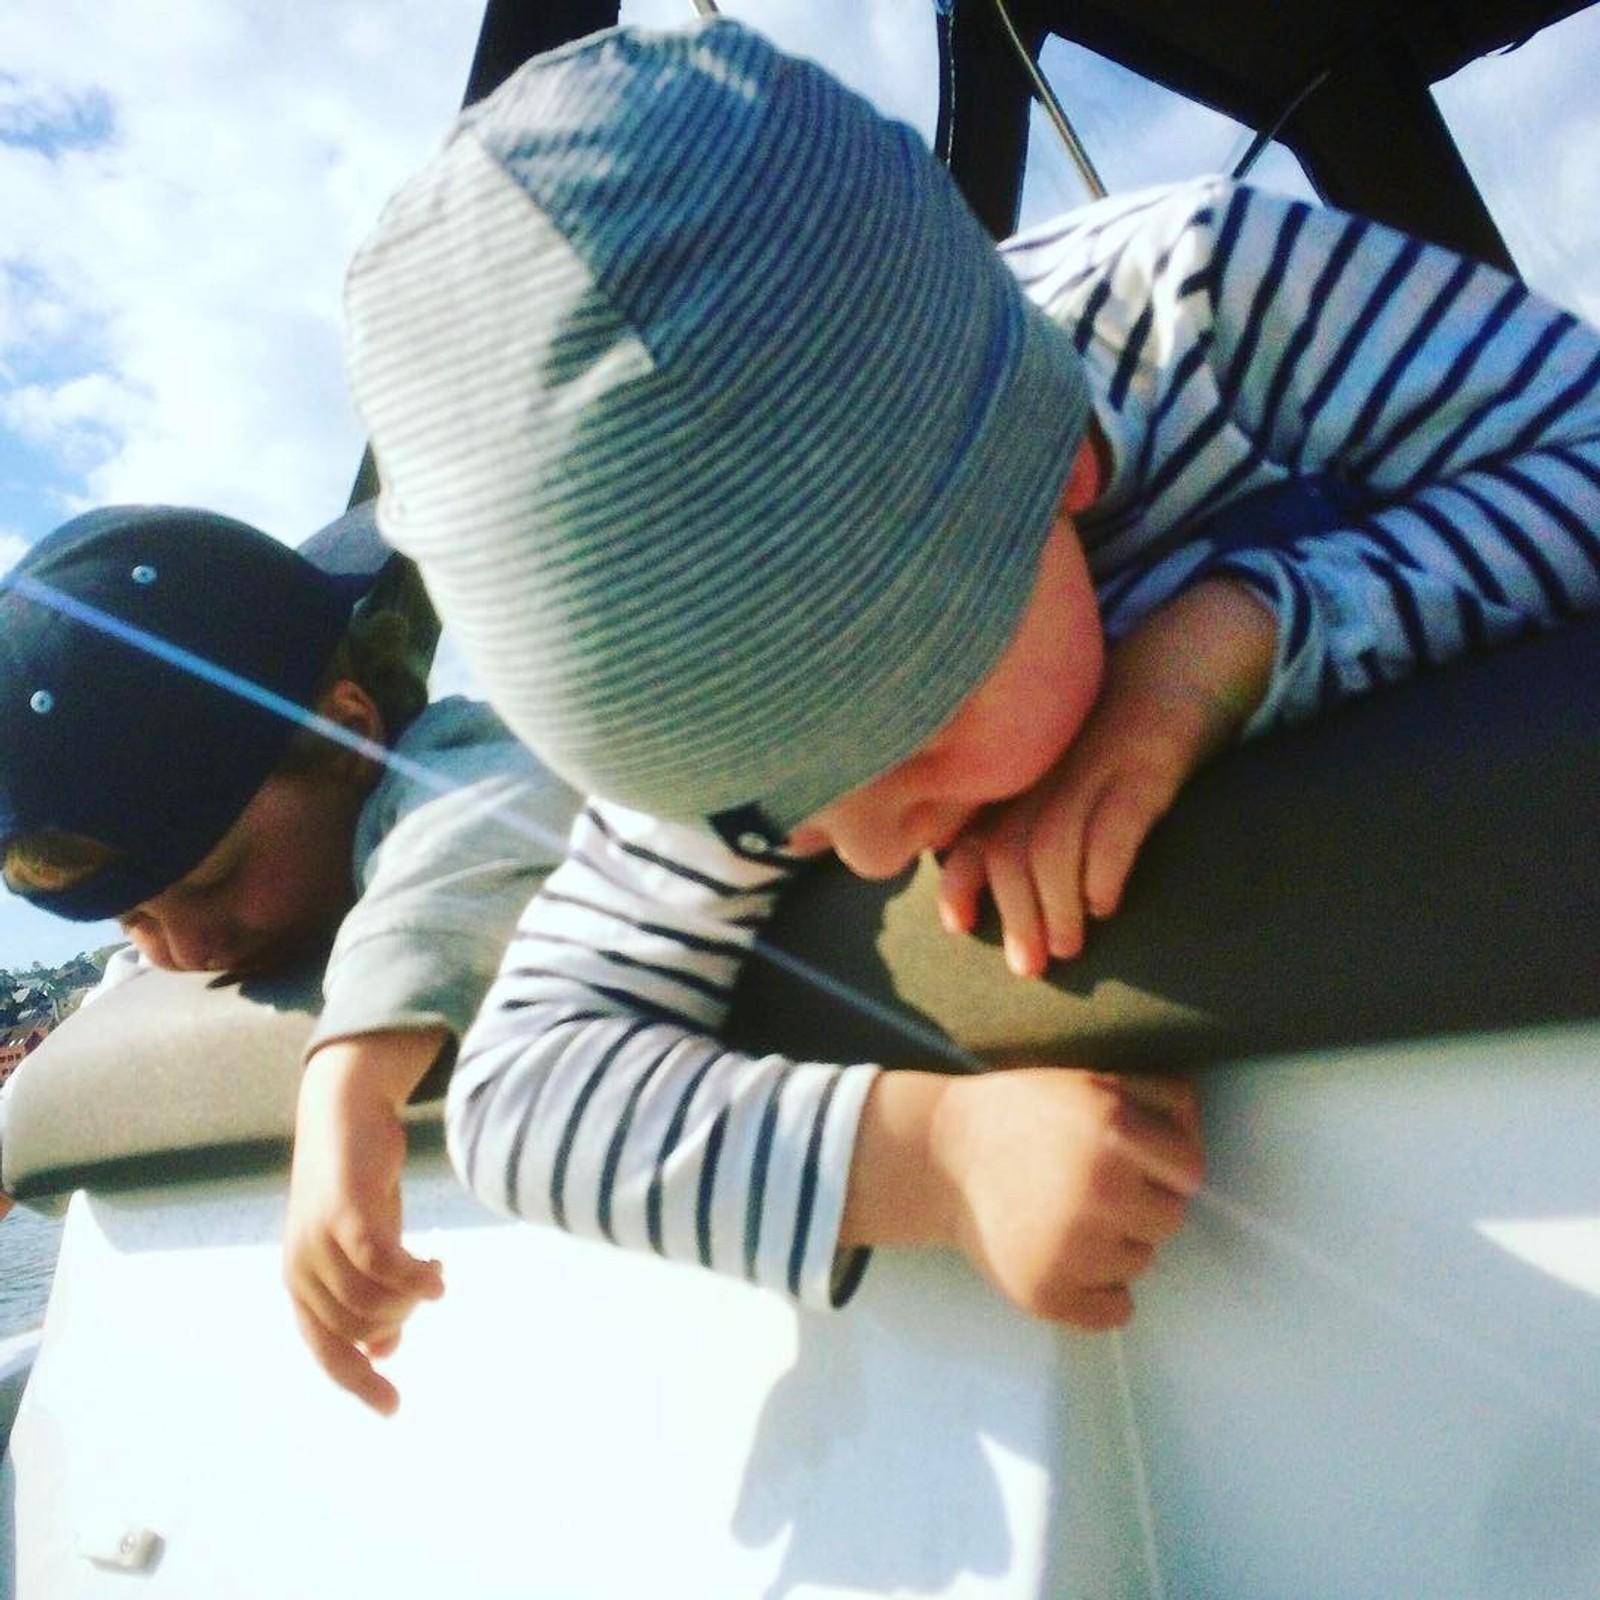 På båttur.